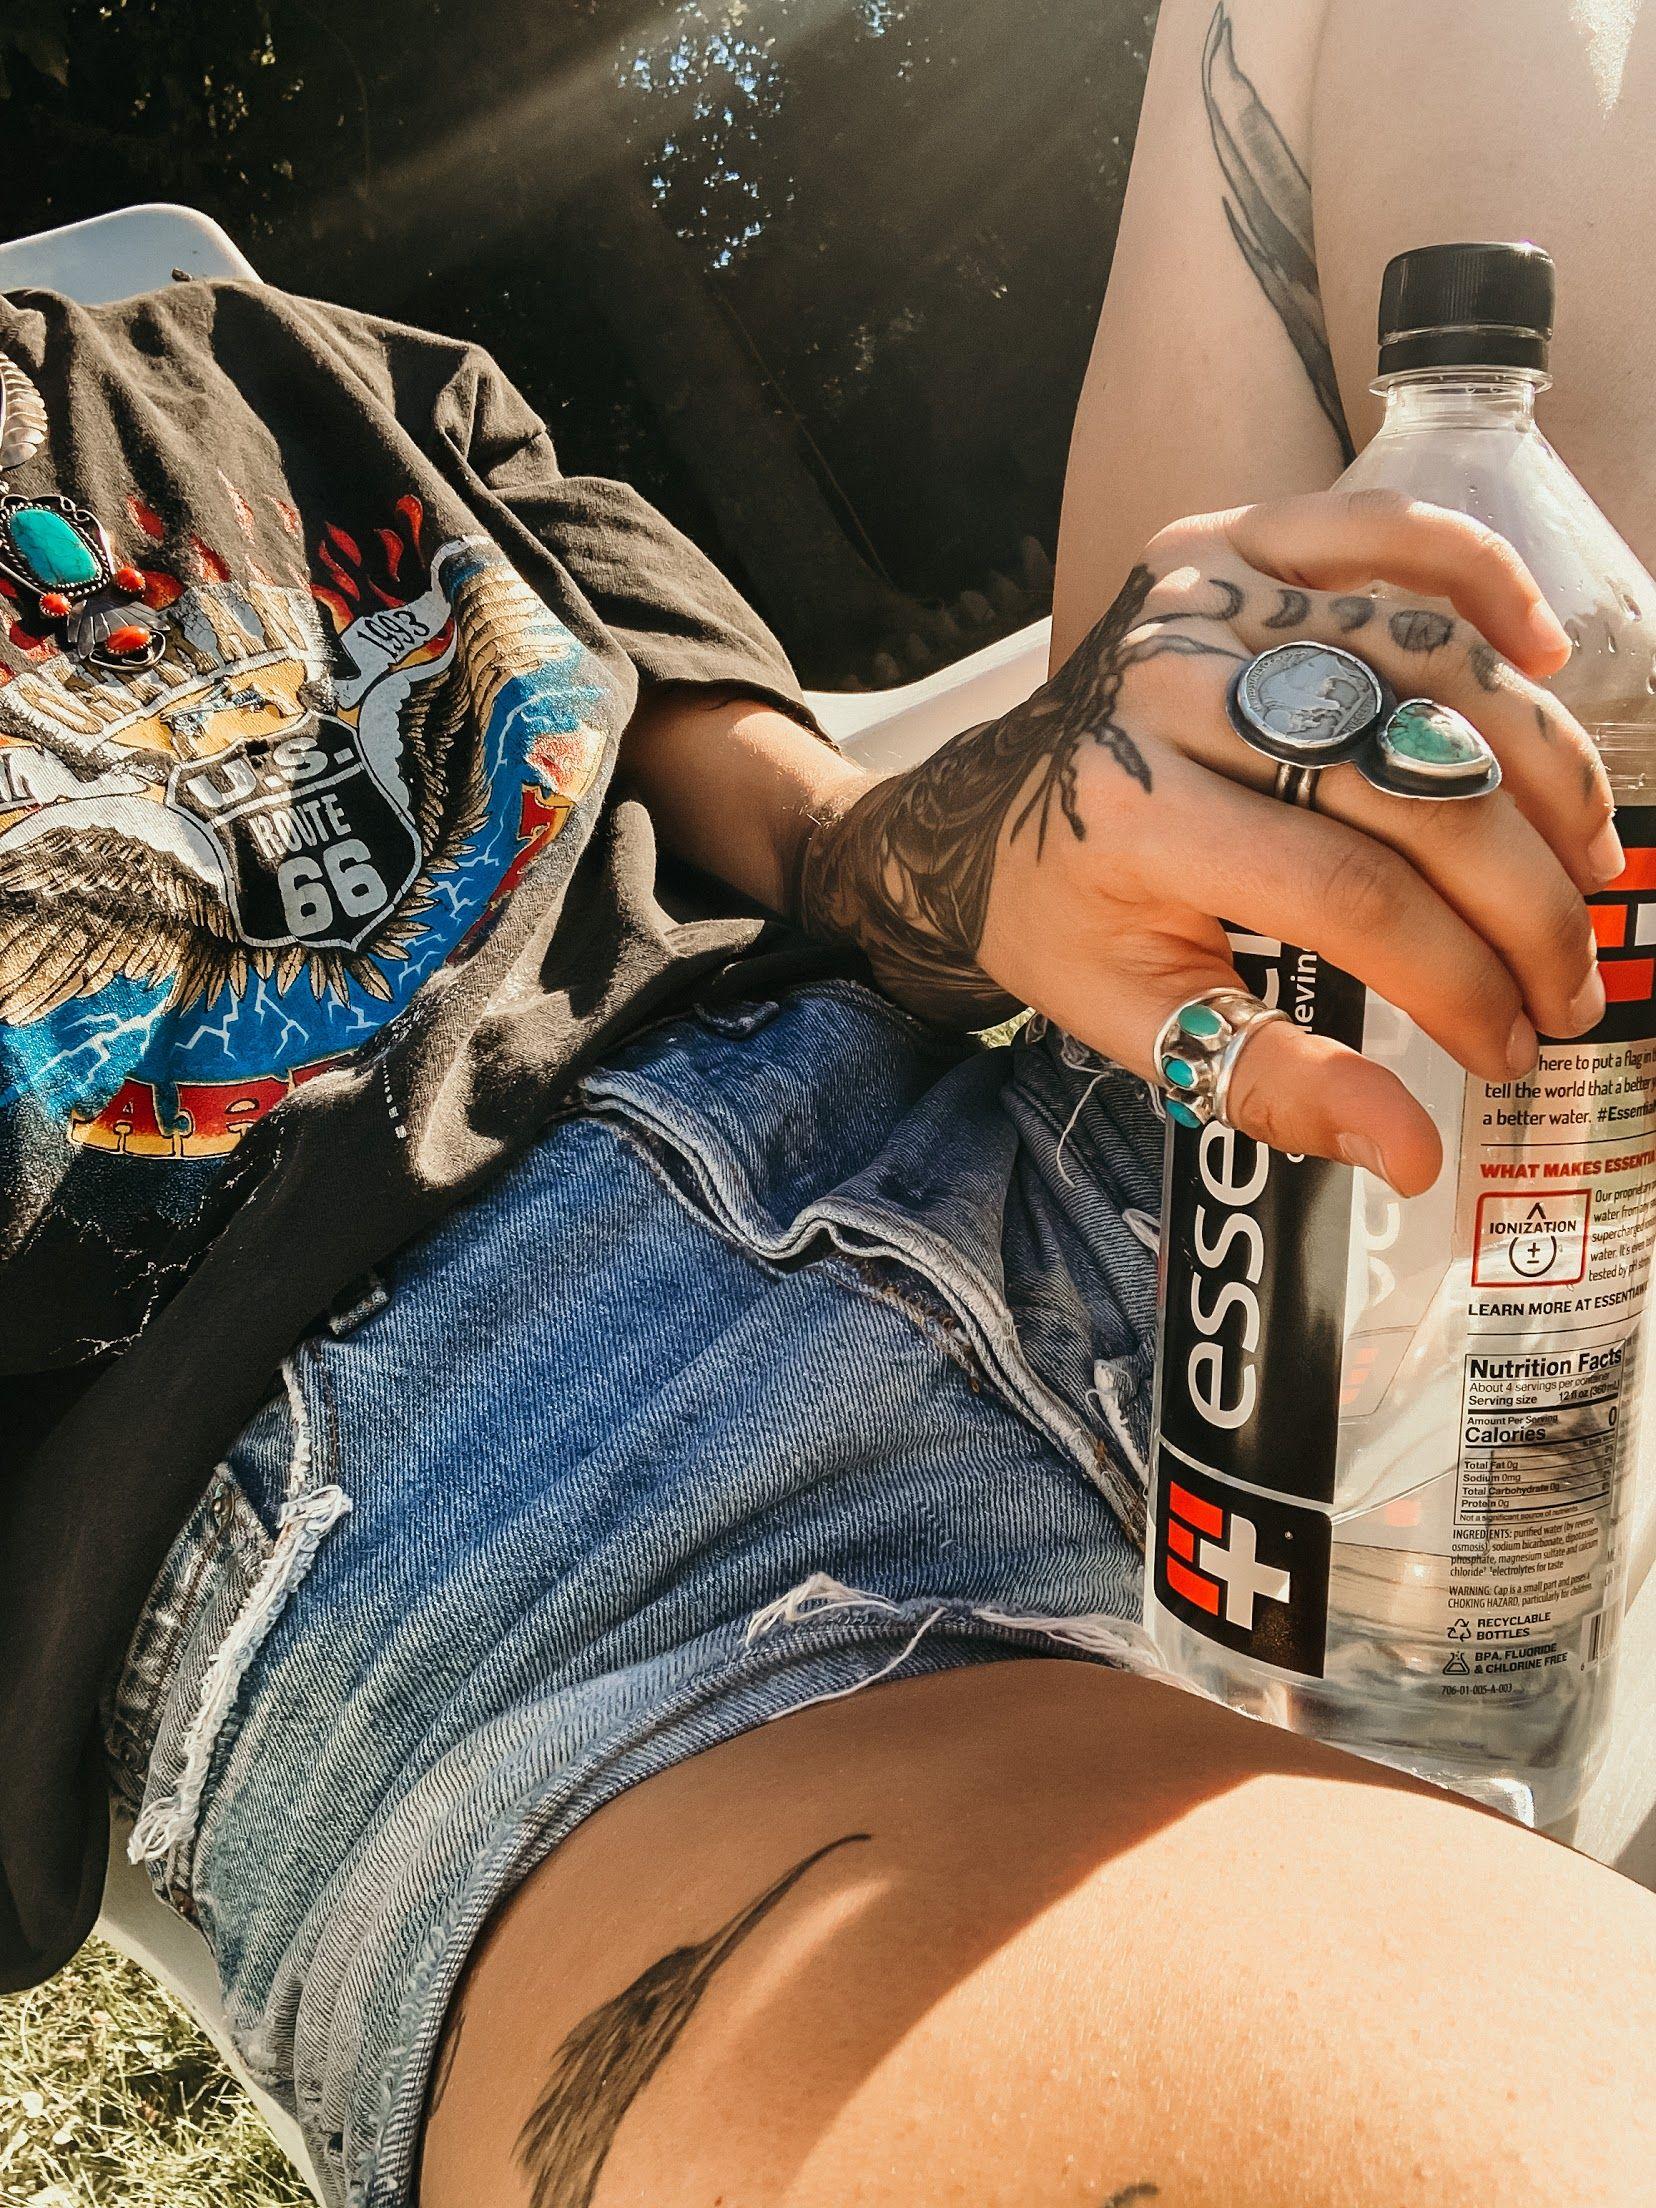 #vintage #boho #bohostyle #bohemian #distressed #handmade #thrifting #thrift #turquoise #photography #levis #denim #vintagestyle #vintagedenim #wildwoman #denimondenim #dessert #festival #coachella #musicfestival #festival #festivalfashion